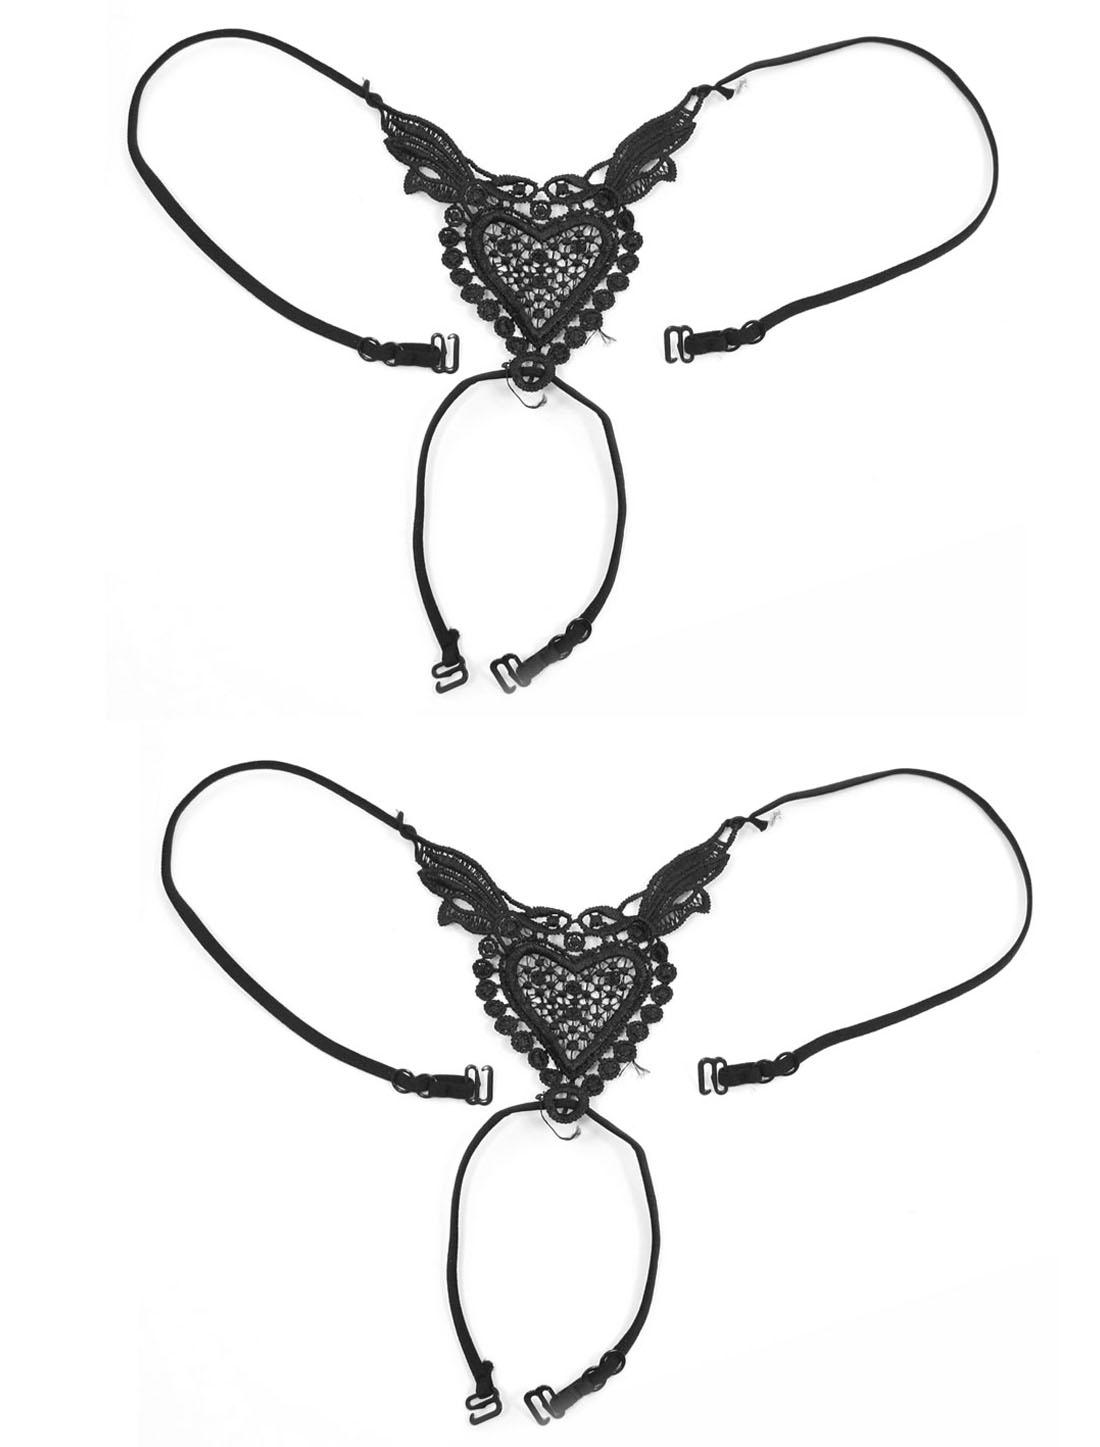 Woman Heart Pattern Adjustable Band Underwear Bra Straps Black 2pcs